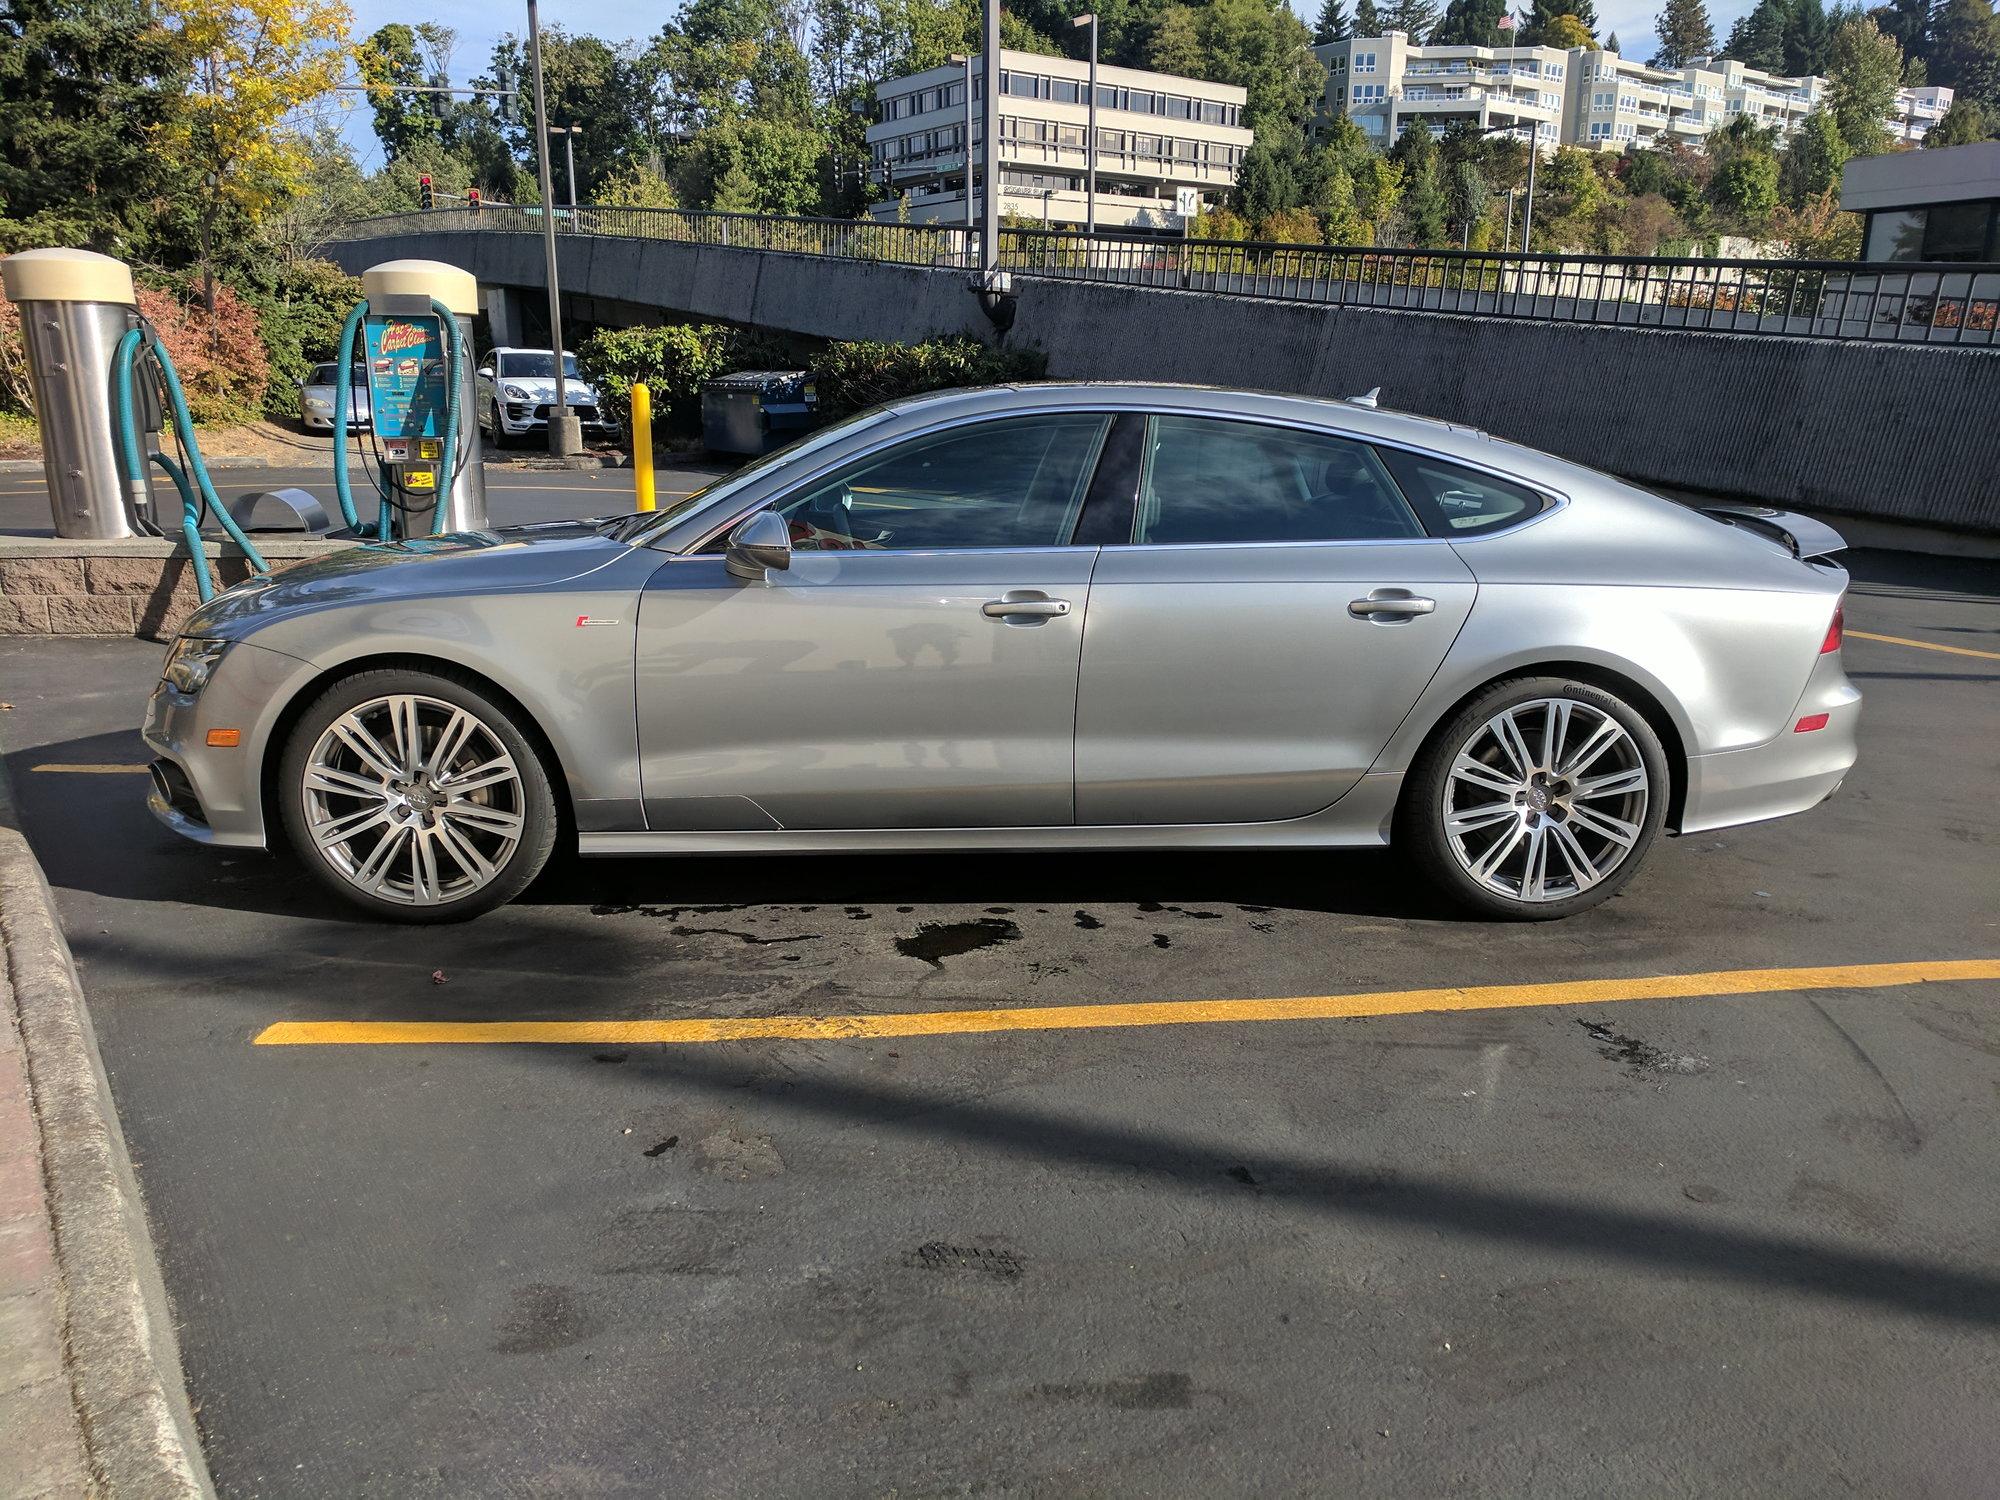 Audi Premium Plus Vs Prestige >> Audi A7 Selling 2013 A7 Prestige - AudiWorld Forums